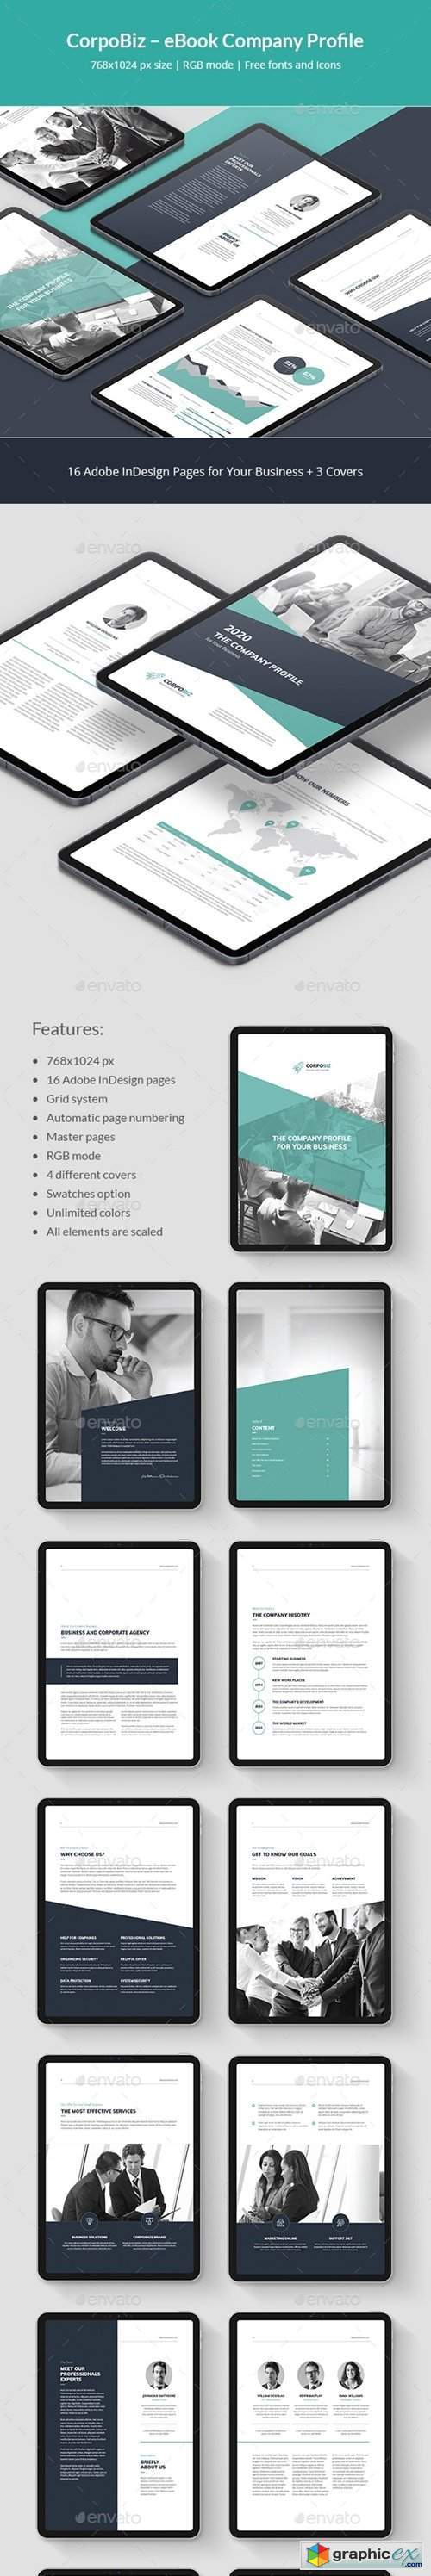 CorpoBiz – Business and Corporate eBook Company Profile